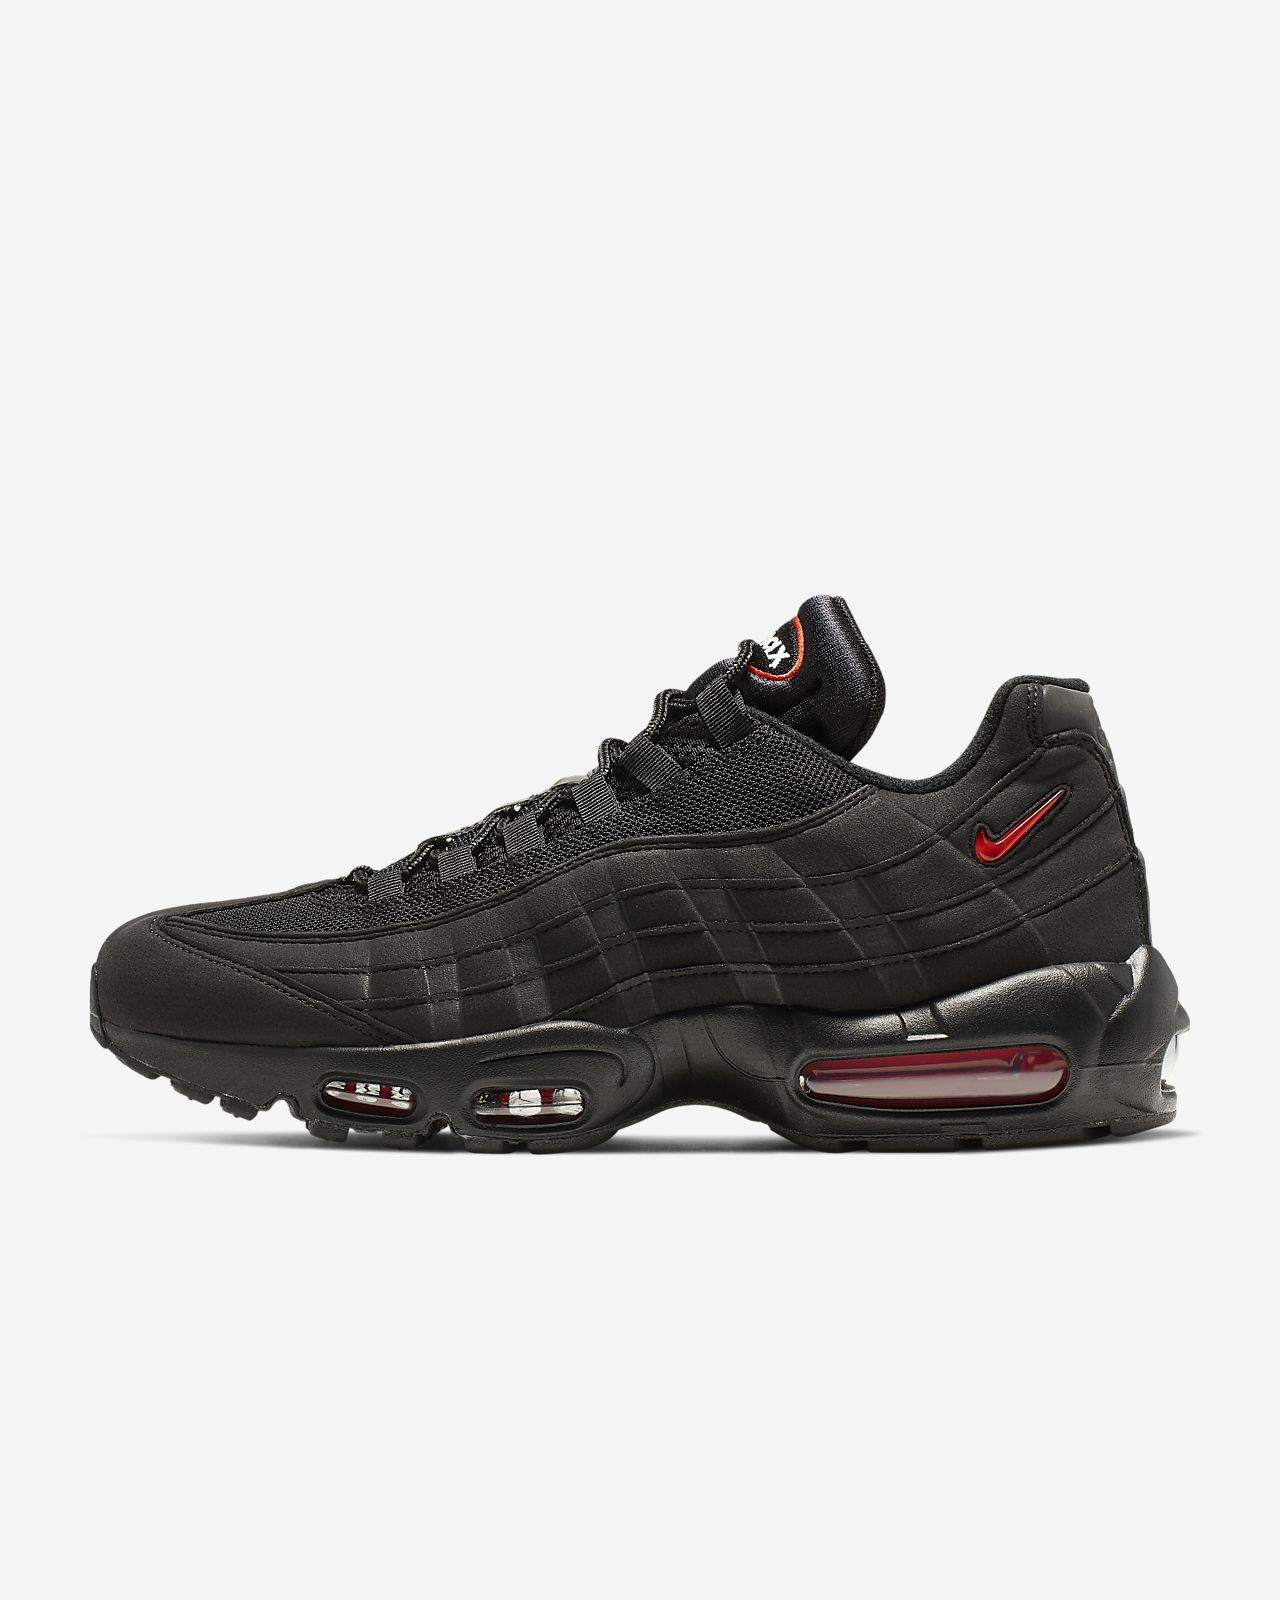 timeless design 4b143 8a032 Nike Air Max 95 SC-sko til mænd